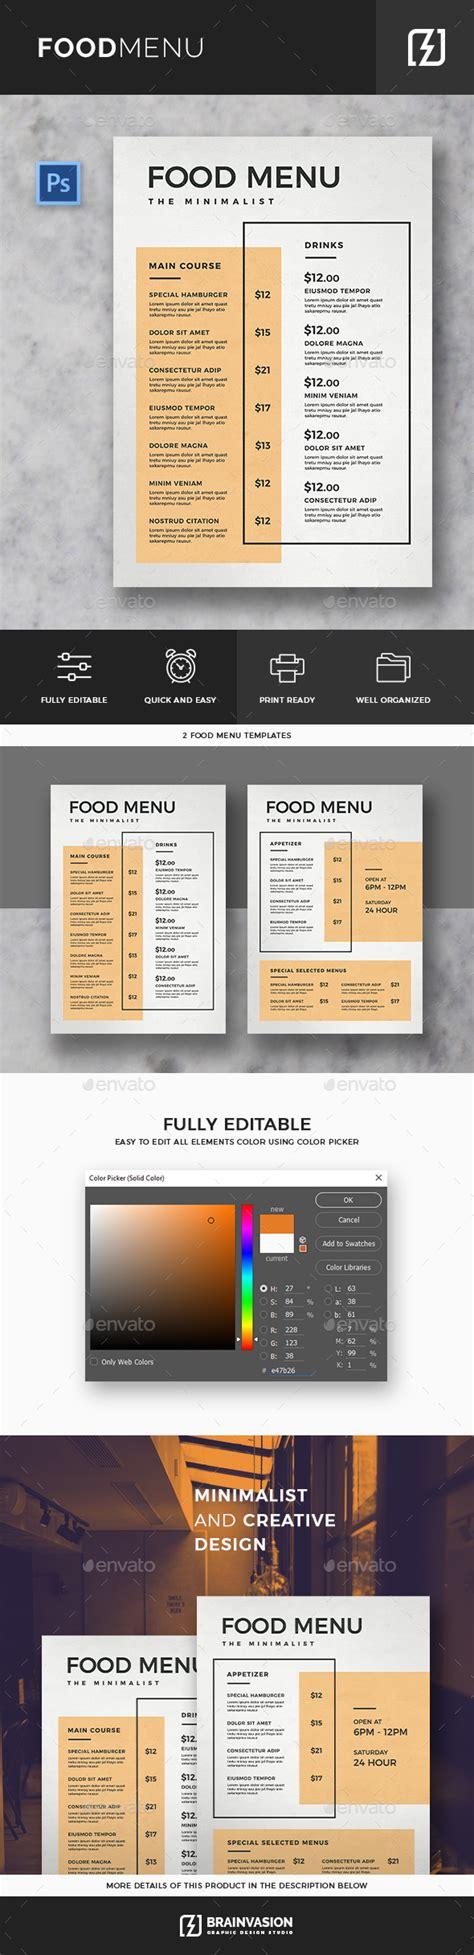 Minimal Food Menu Template By Brainvasion Graphicriver Minimal Menu Template